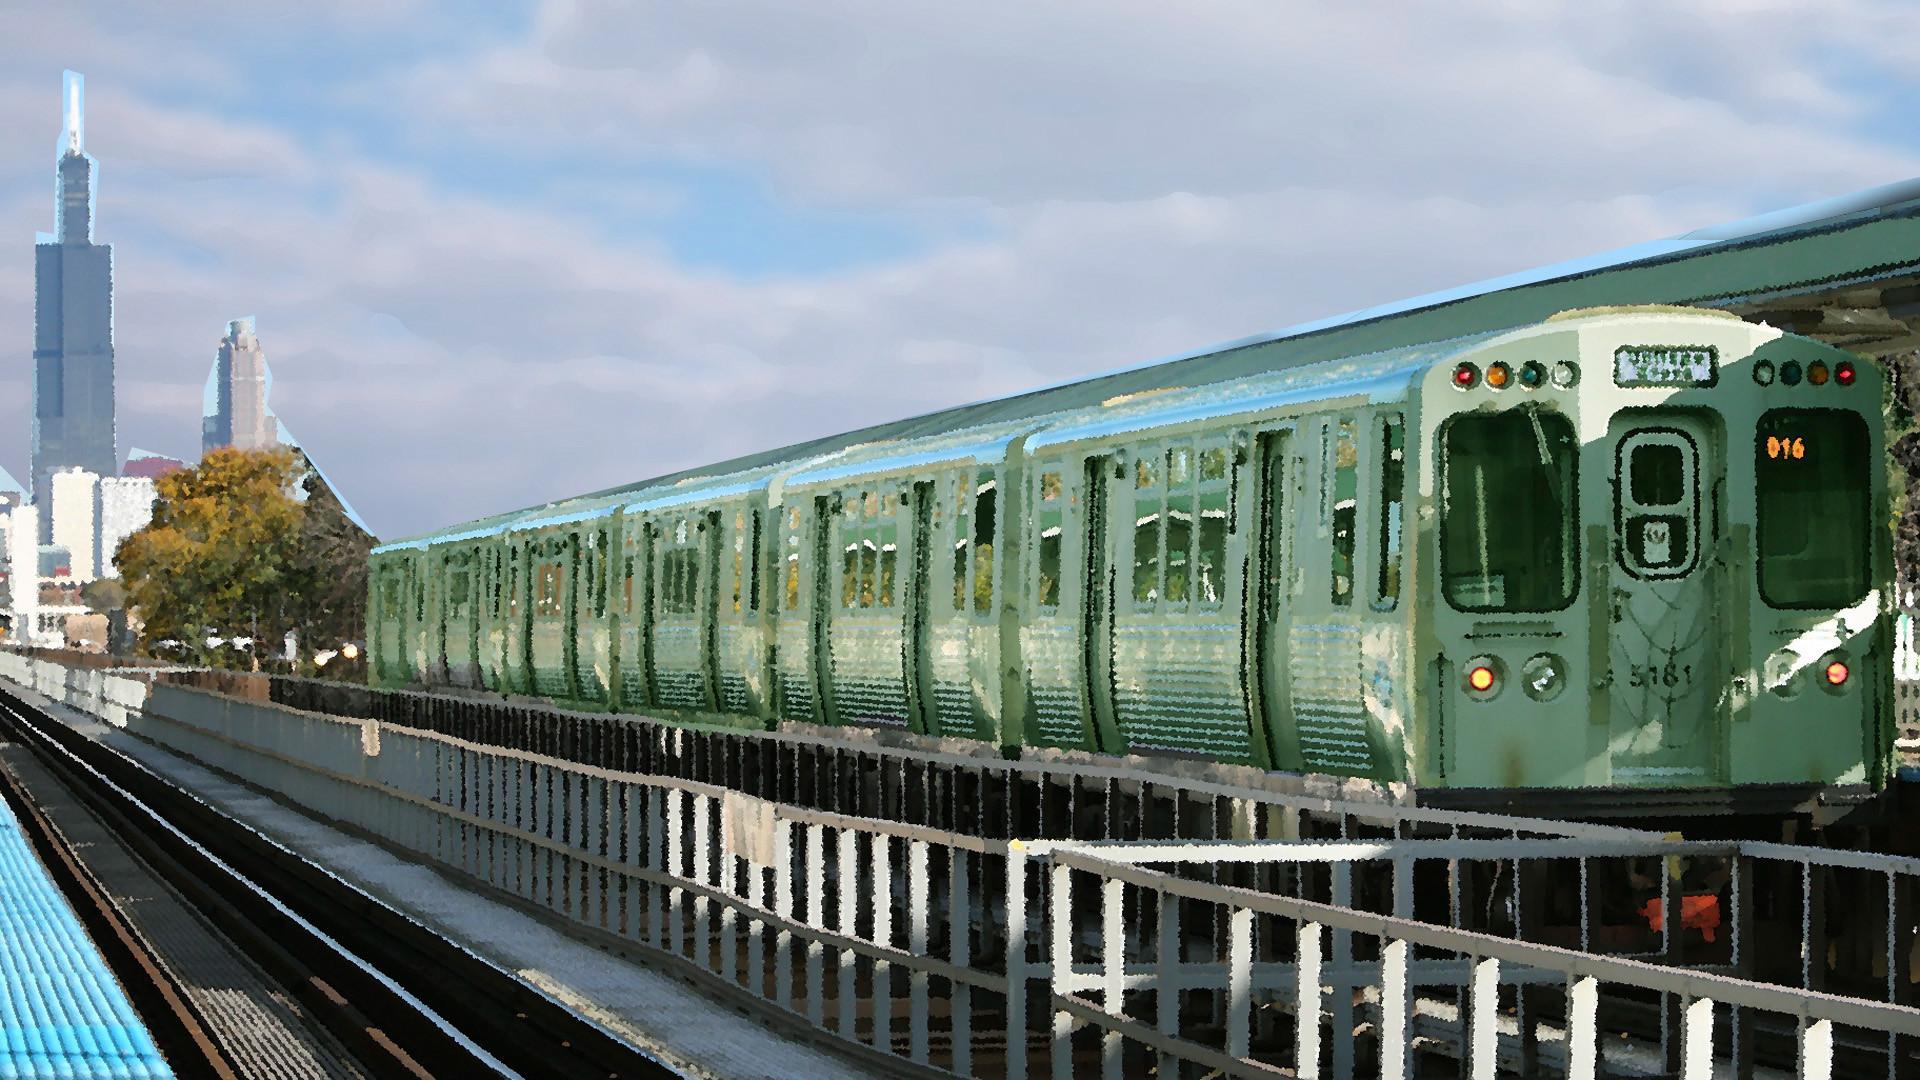 Man dies after falling on third rail at CTA Blue Line